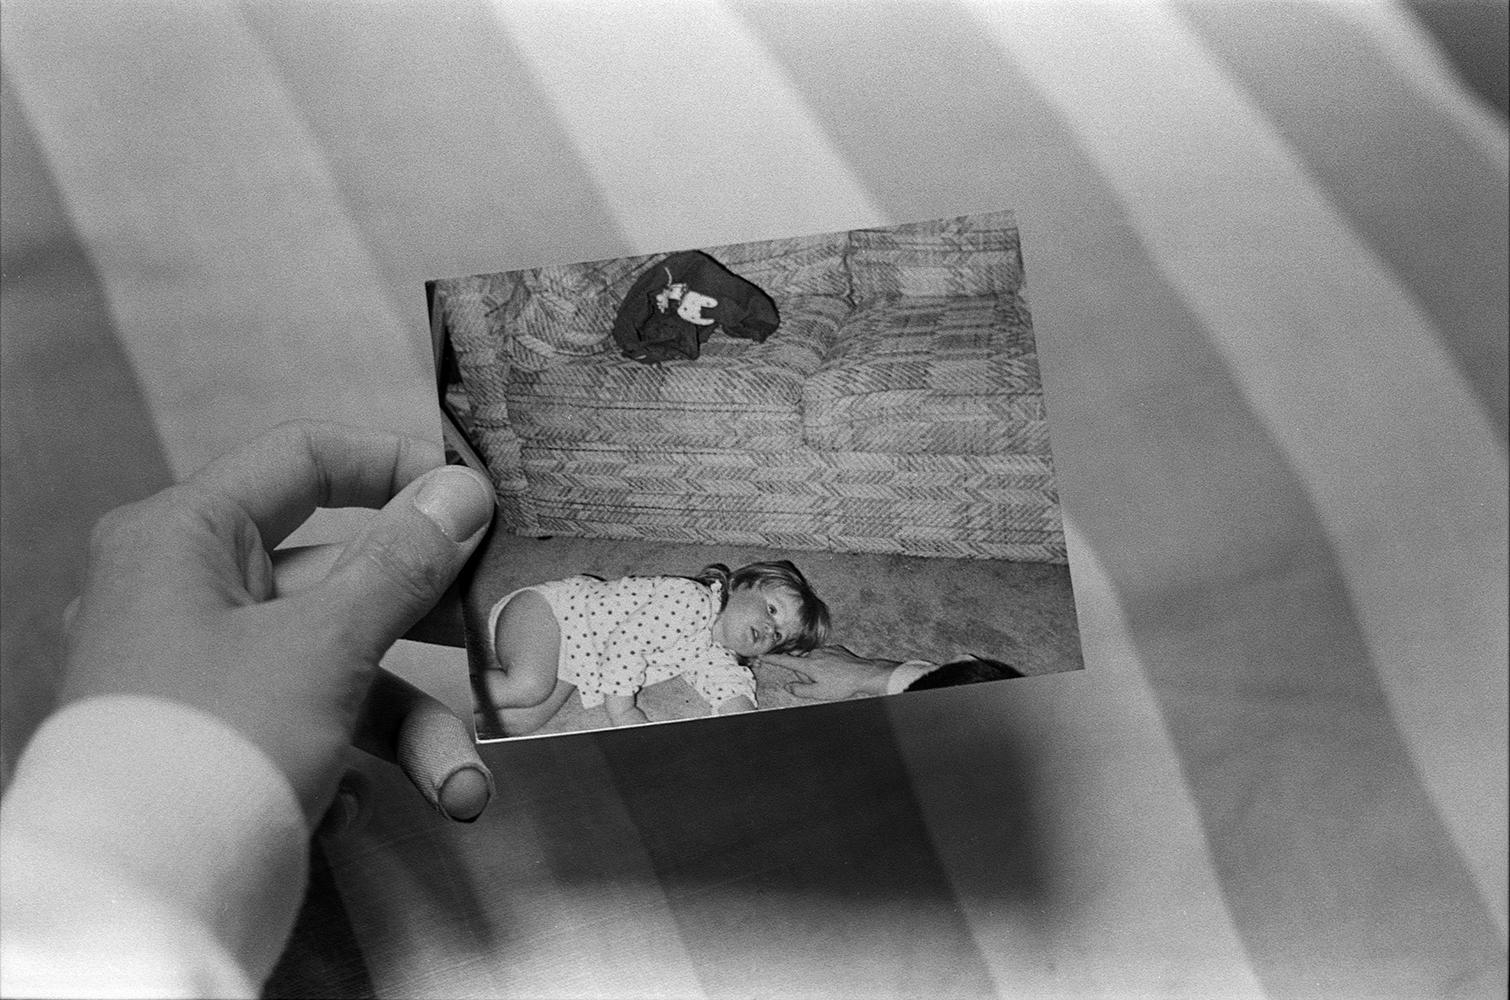 Katie // 35mm photograph, 2019